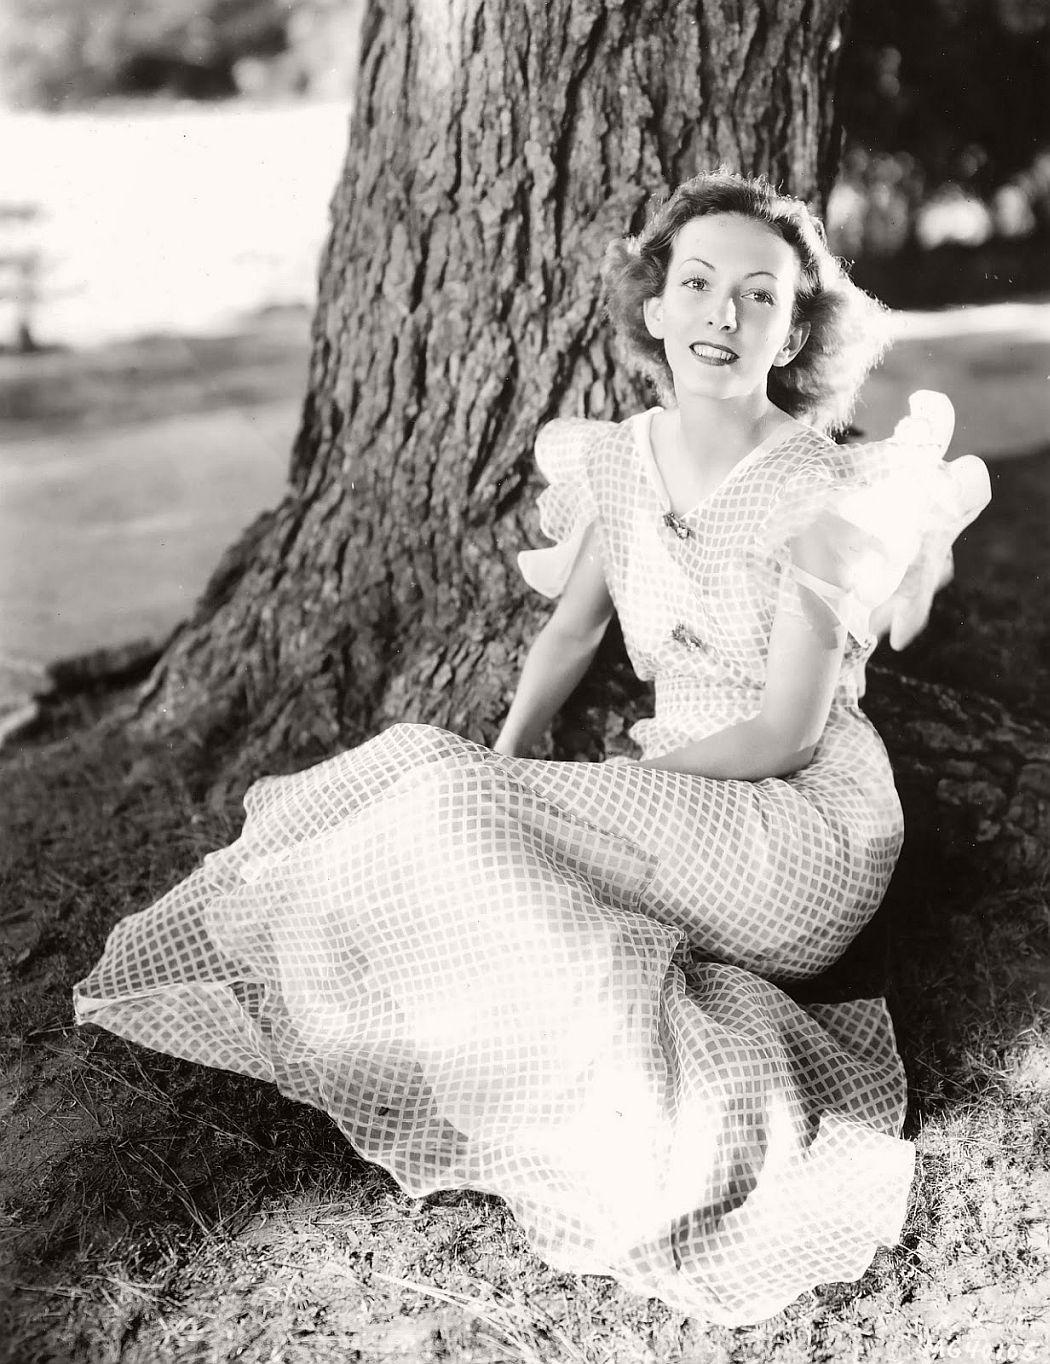 vintage-black-white-portrait-hollywood-movie-actress-1930s-Karen-Morley